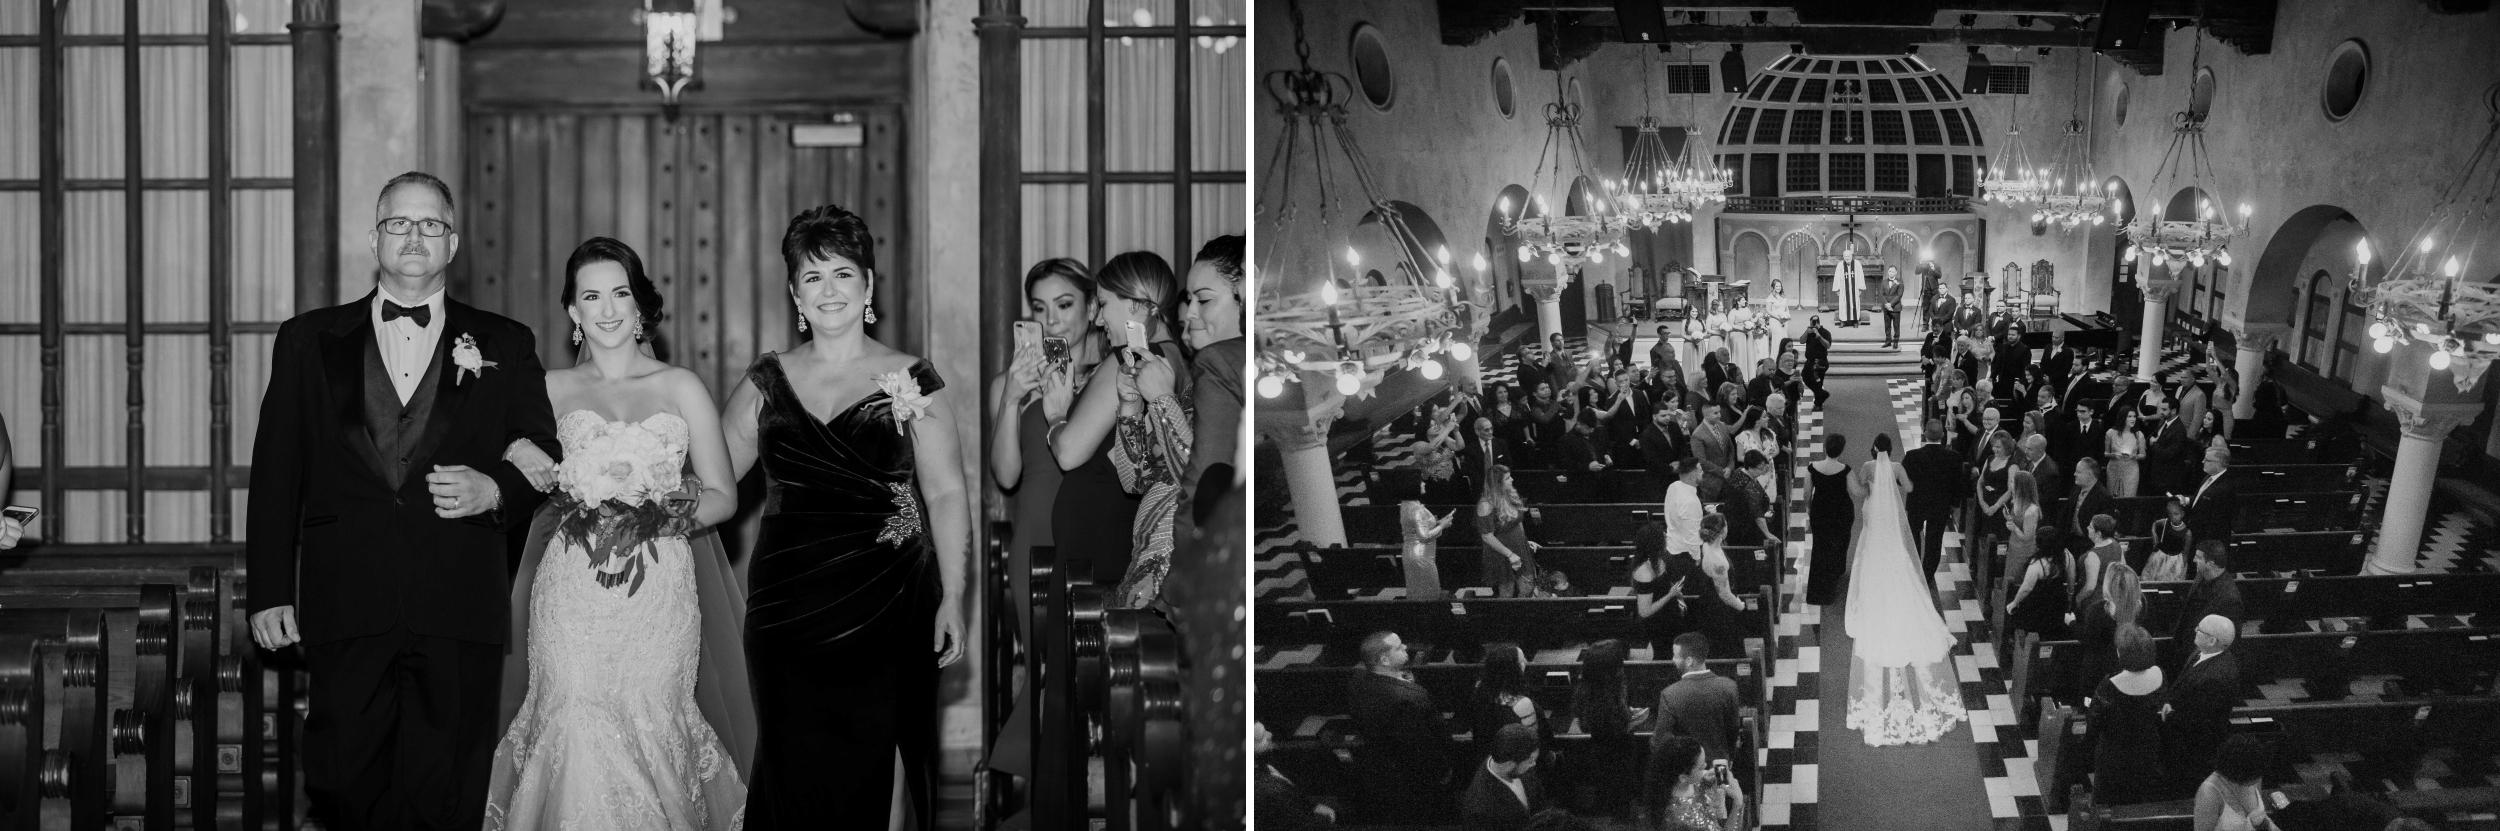 Wedding - Coco Plum - Coral Gables Congregational - Santy Martinez Photography 19.jpg